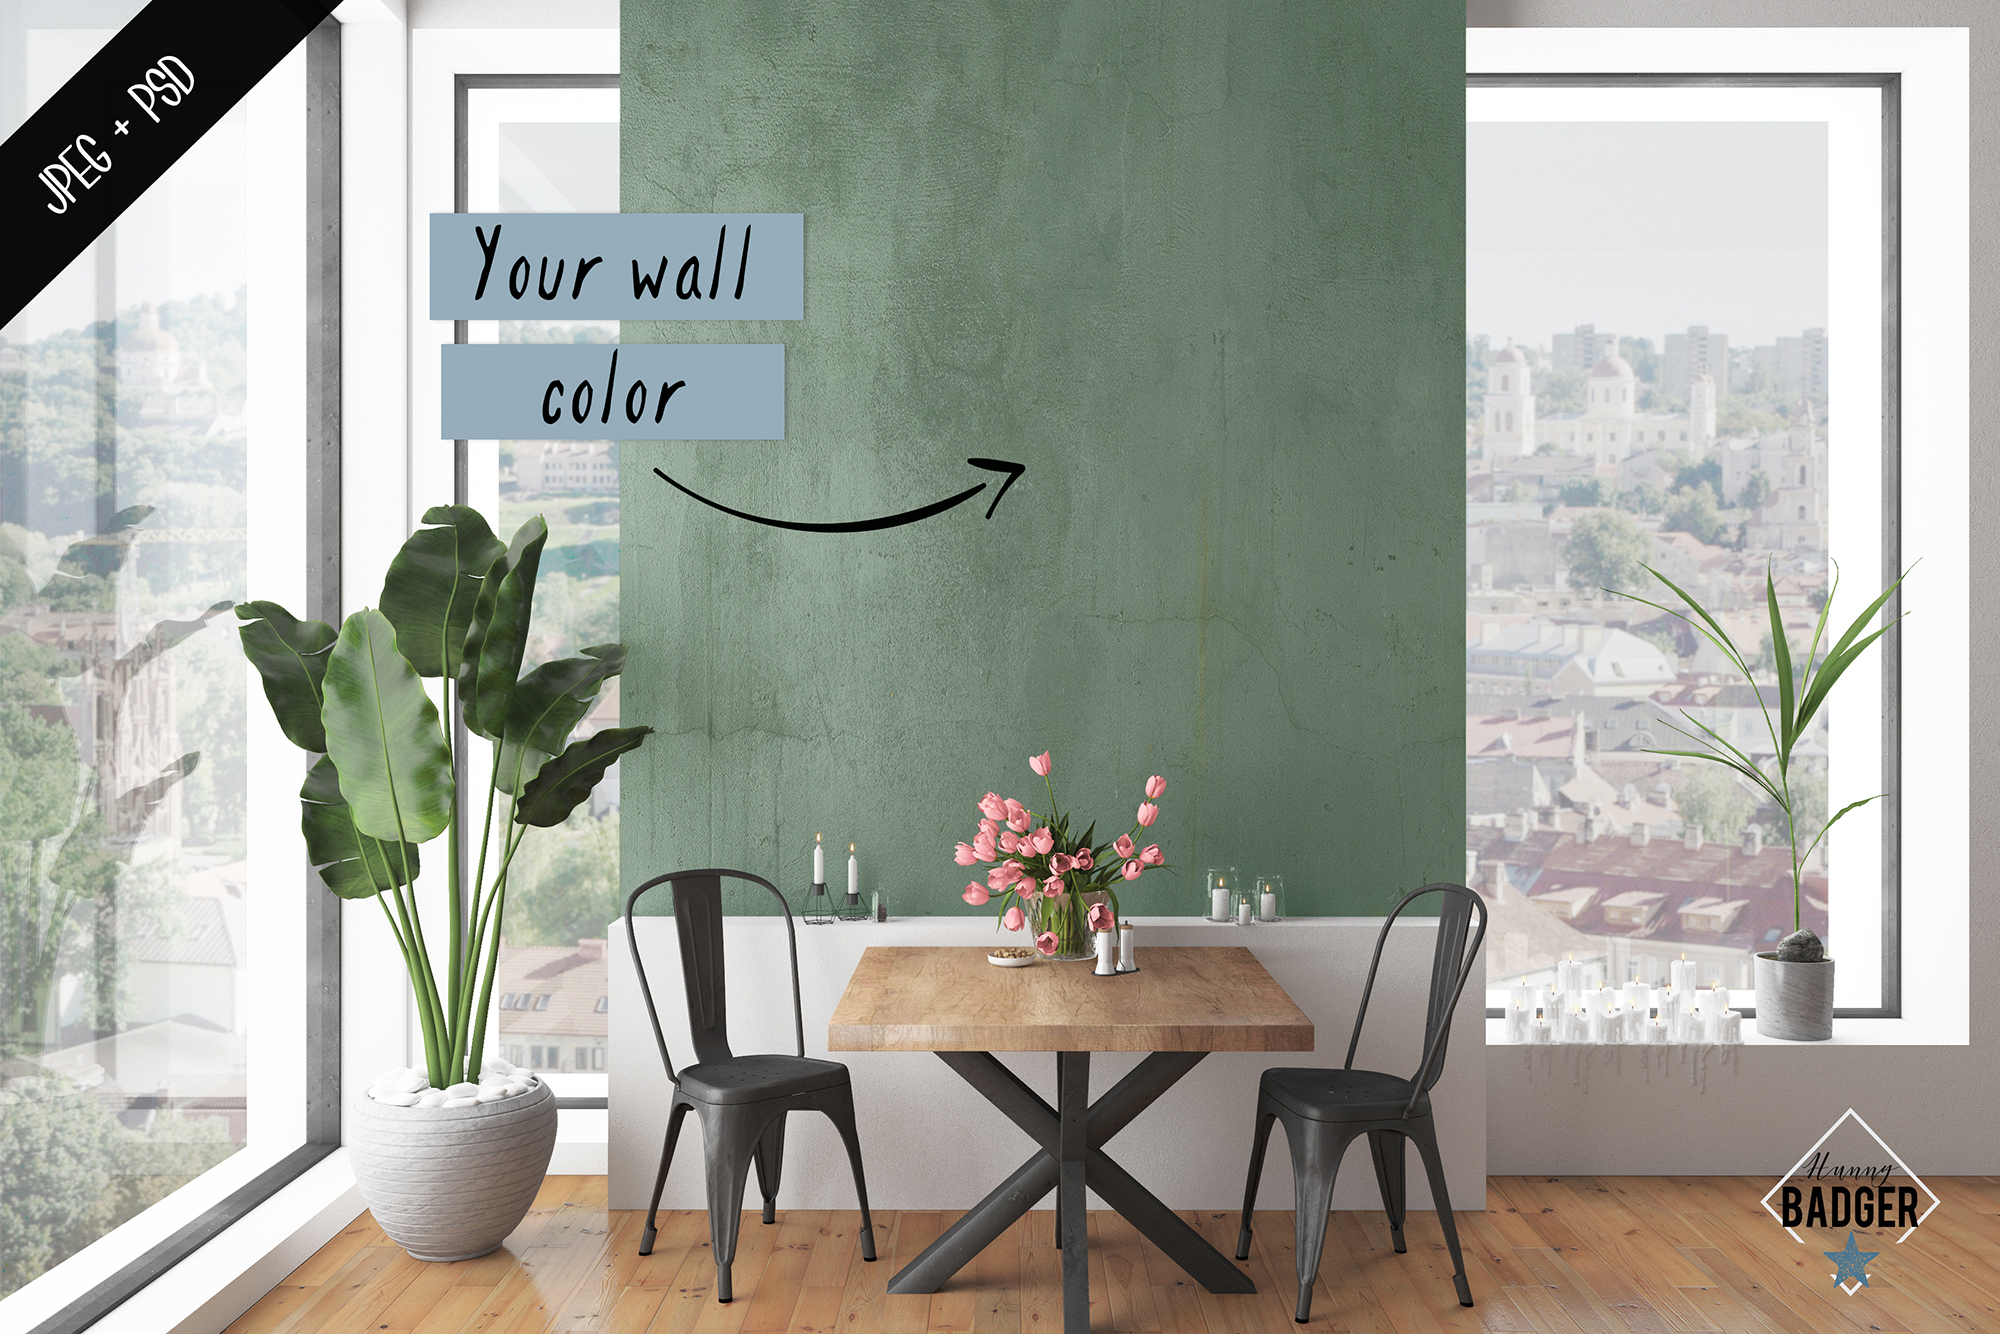 Interior mockup - frame & wall mockup creator example image 6